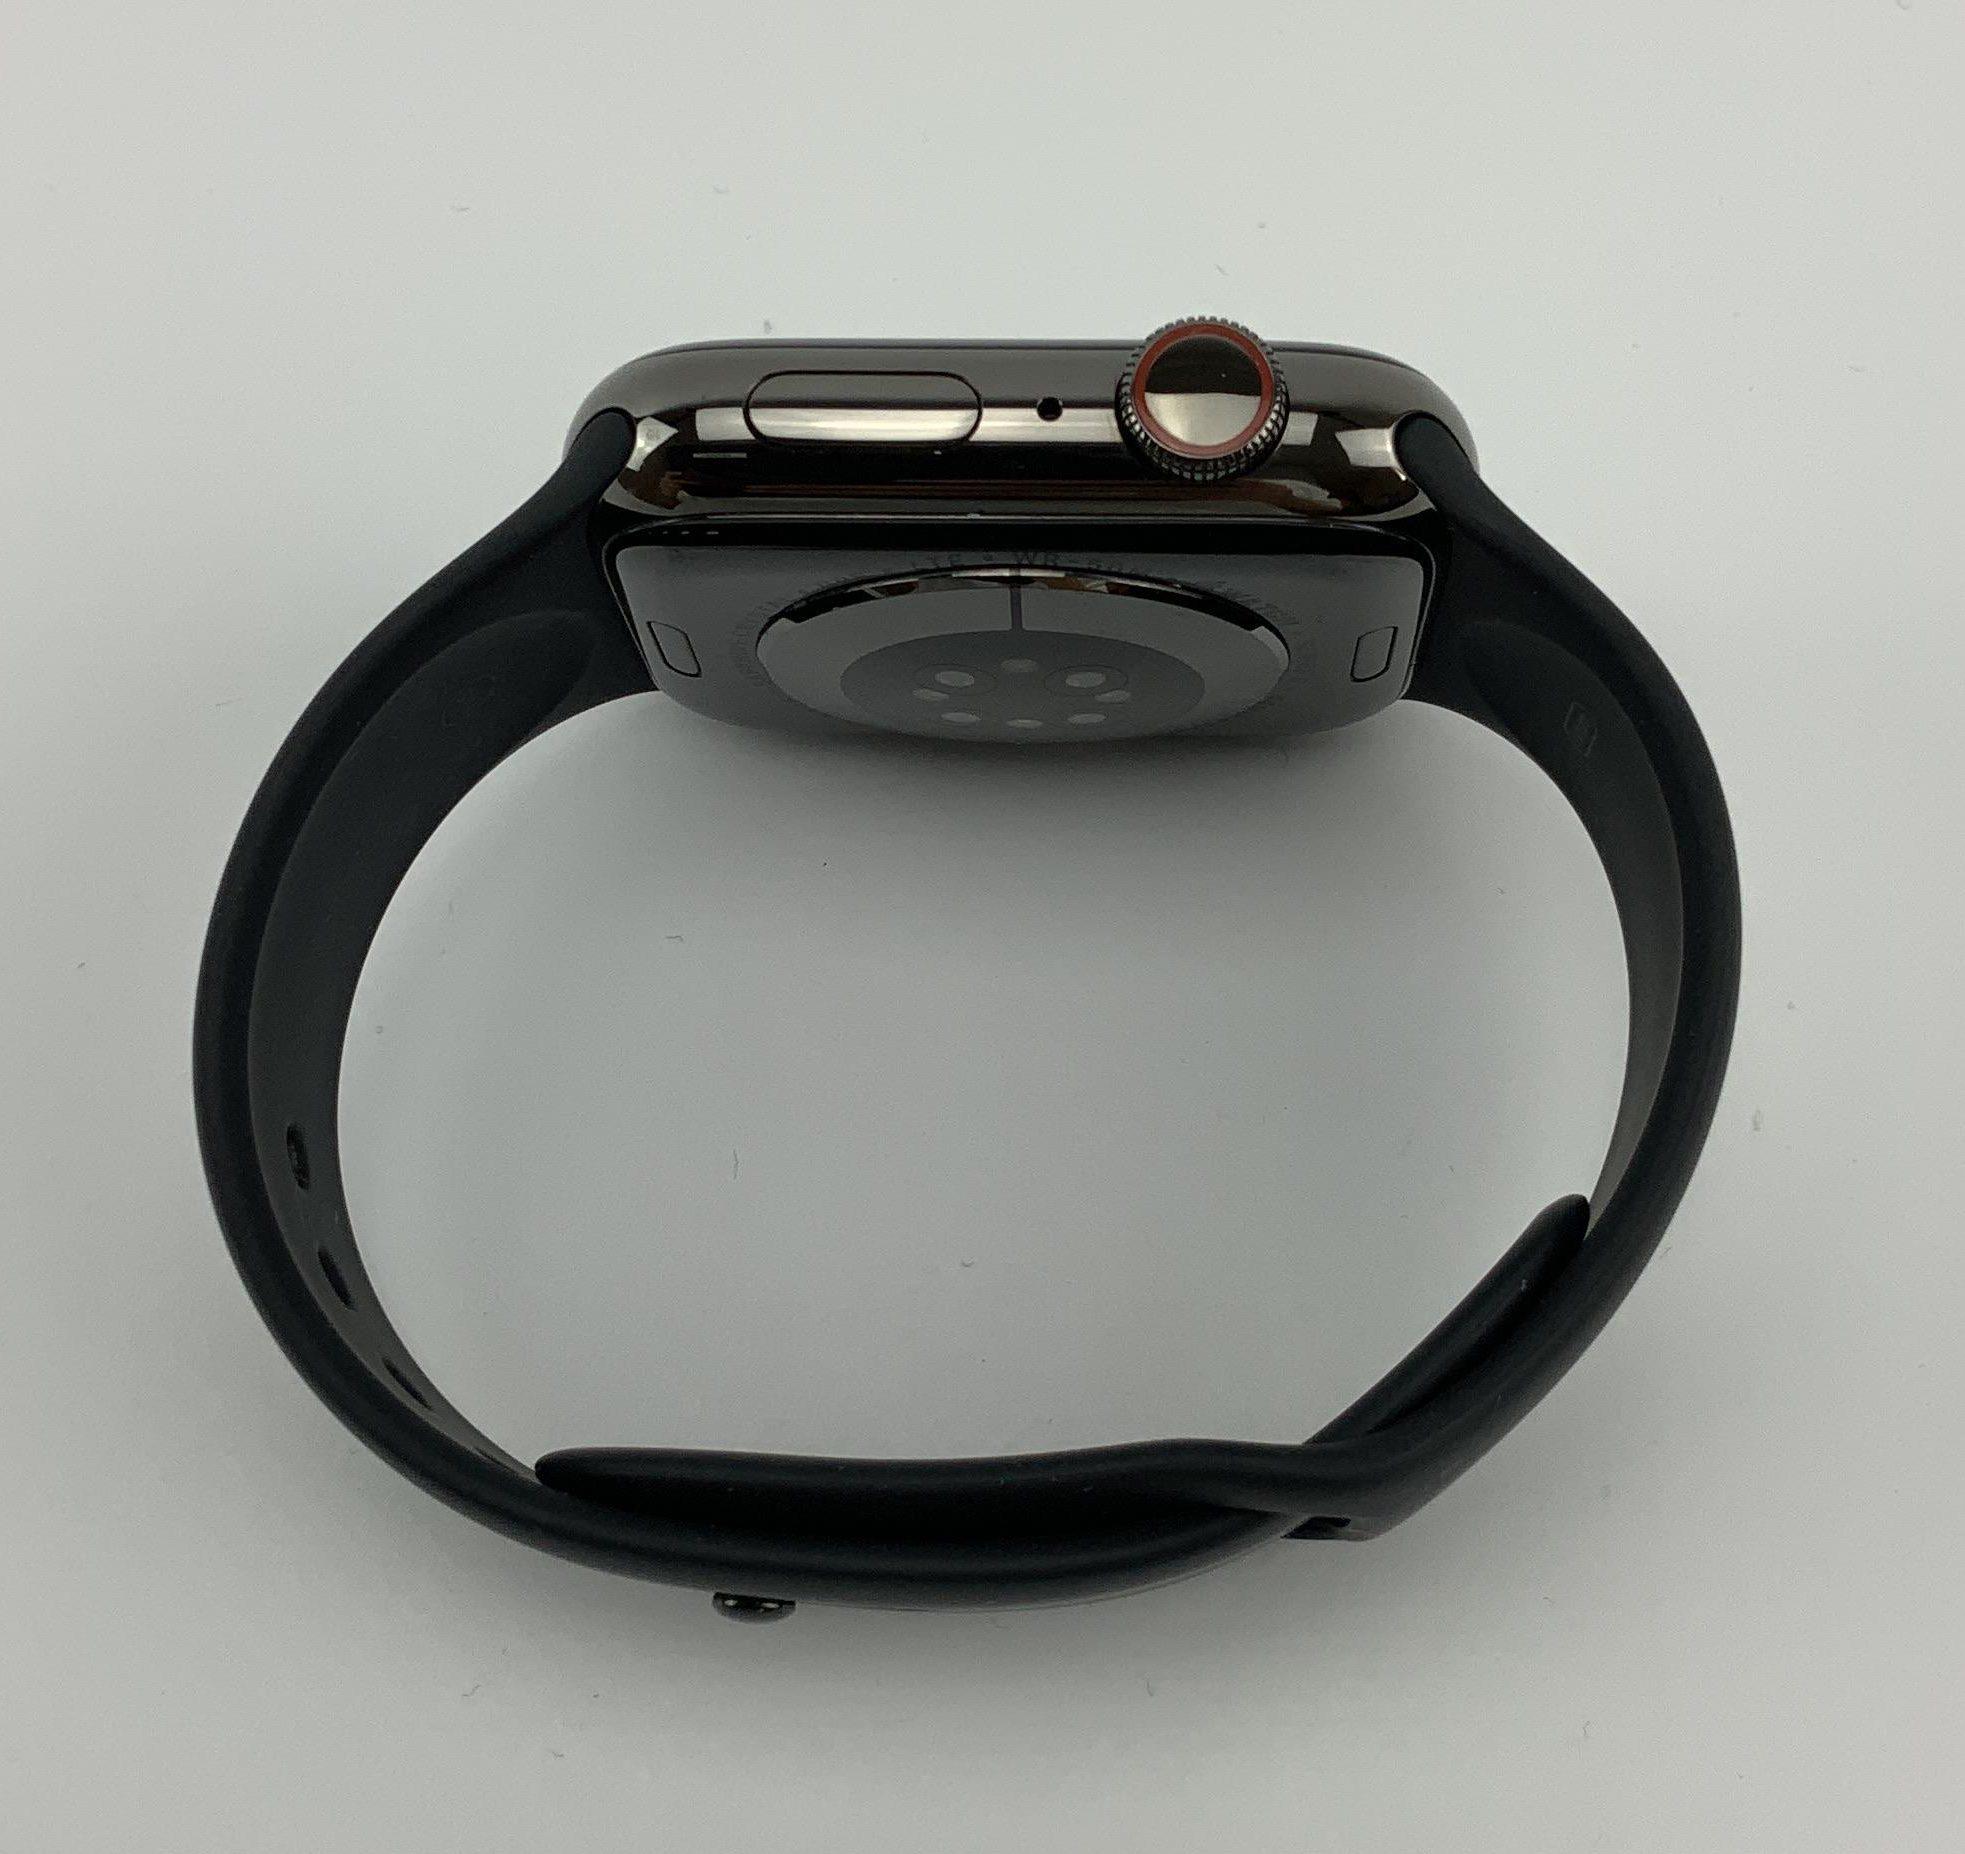 Watch Series 6 Steel Cellular (44mm), Graphite, Afbeelding 2